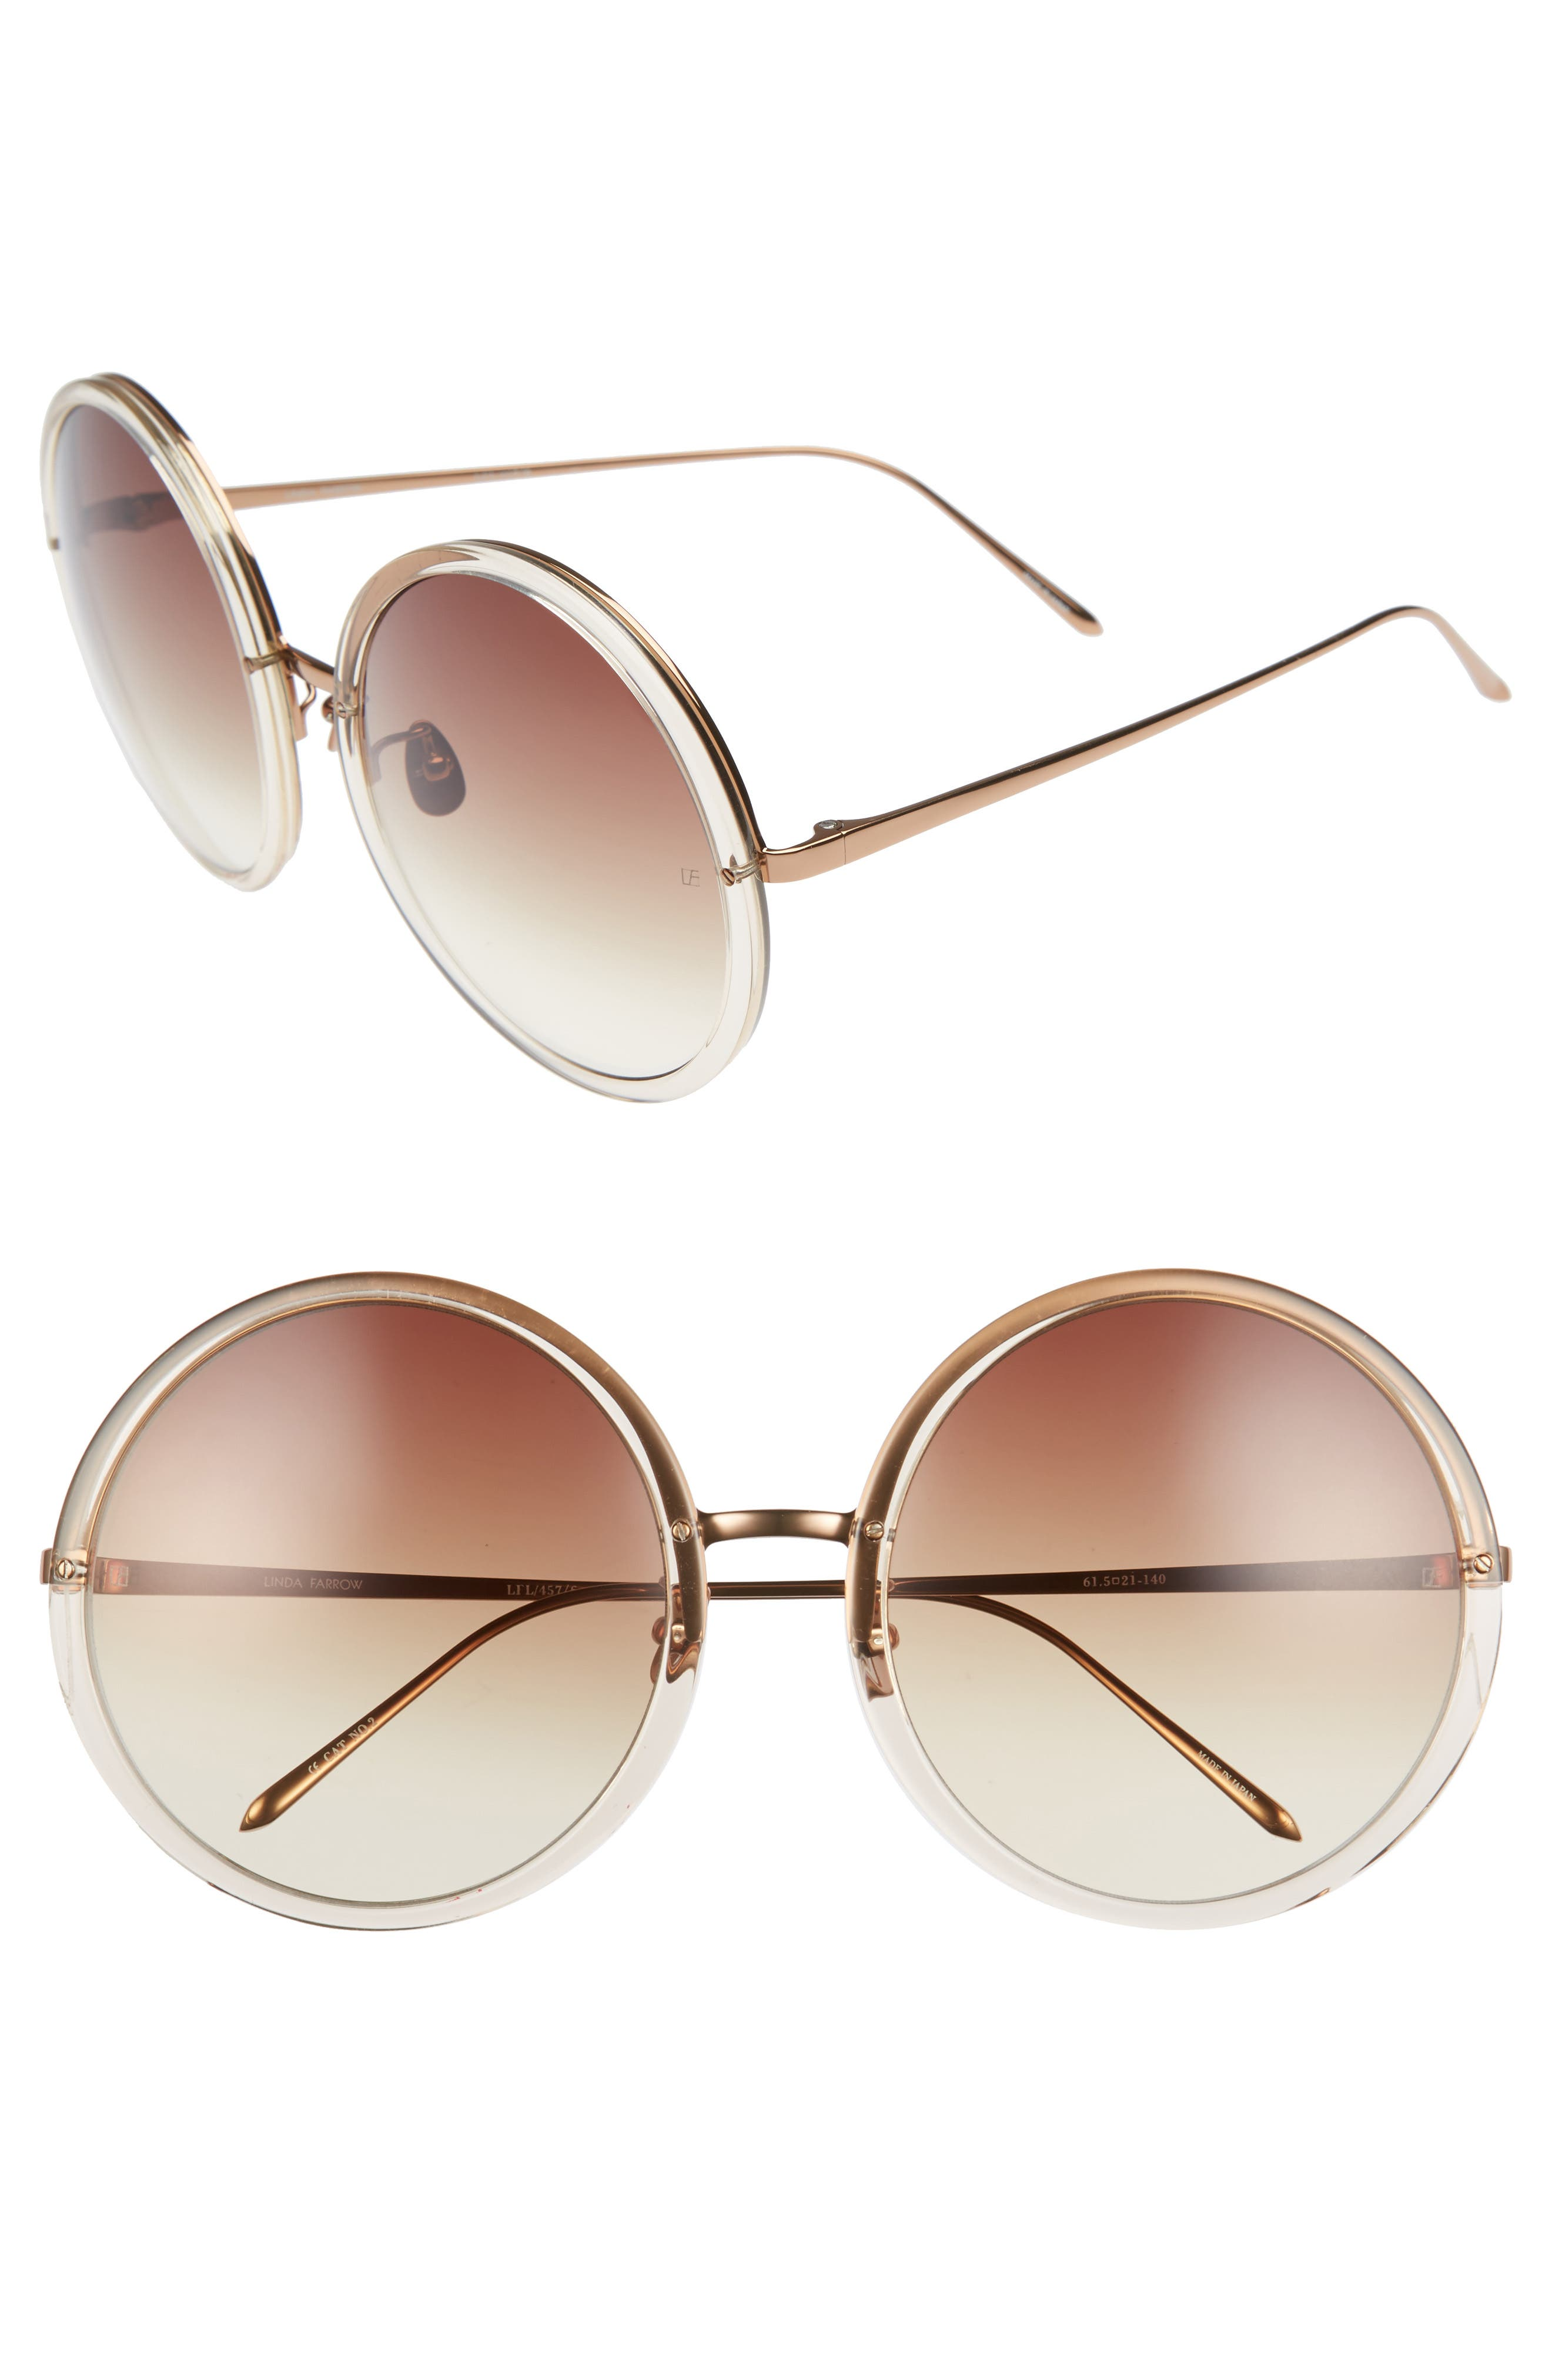 61mm Round 18 Karat Gold Trim Sunglasses,                         Main,                         color, 020